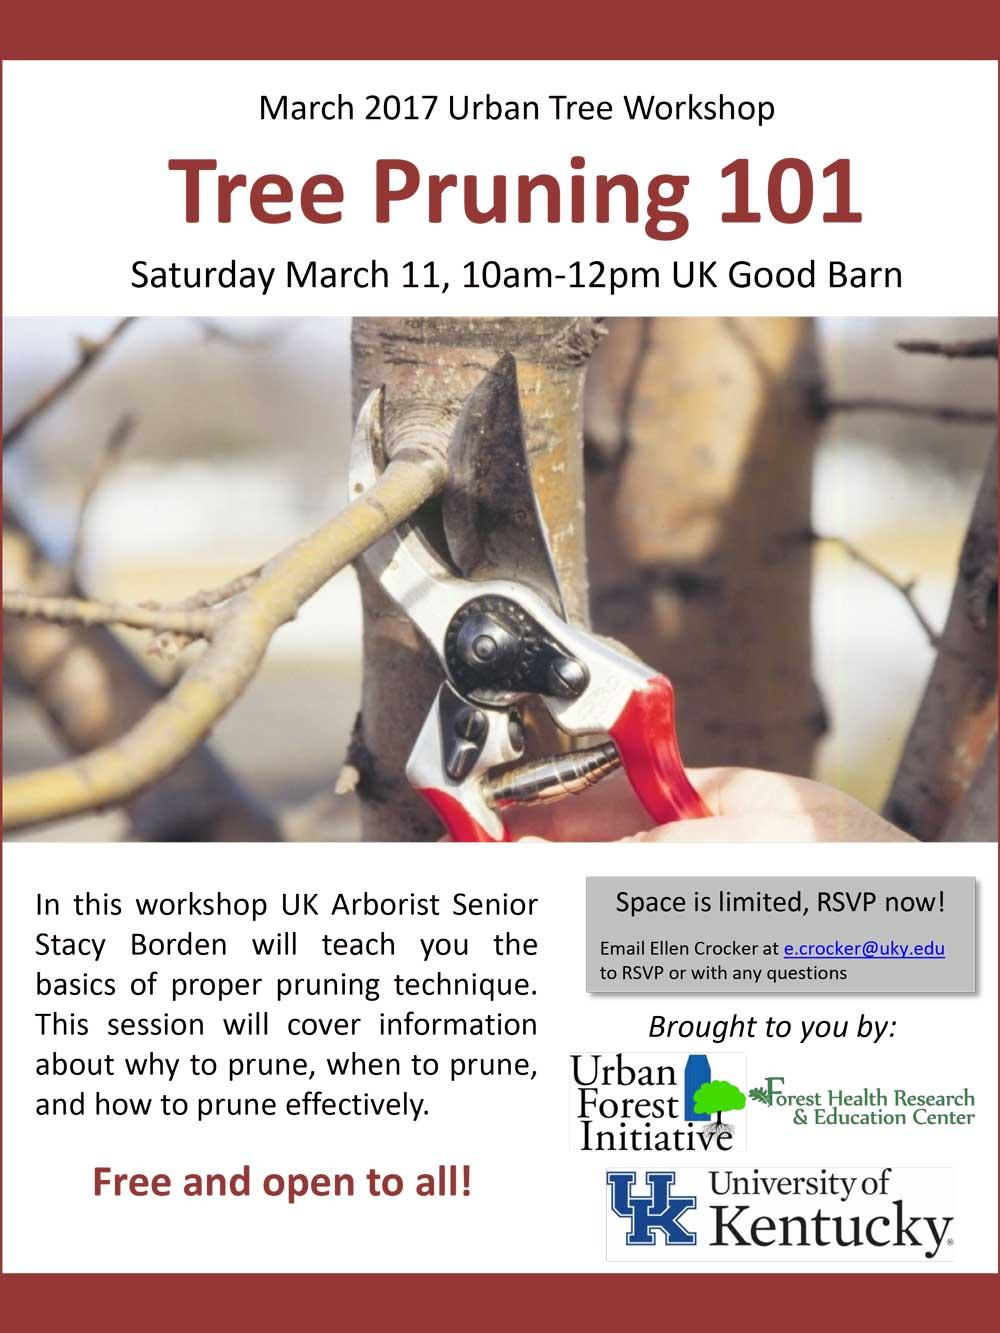 Tree pruning workshop flyer (March 11, 2017)